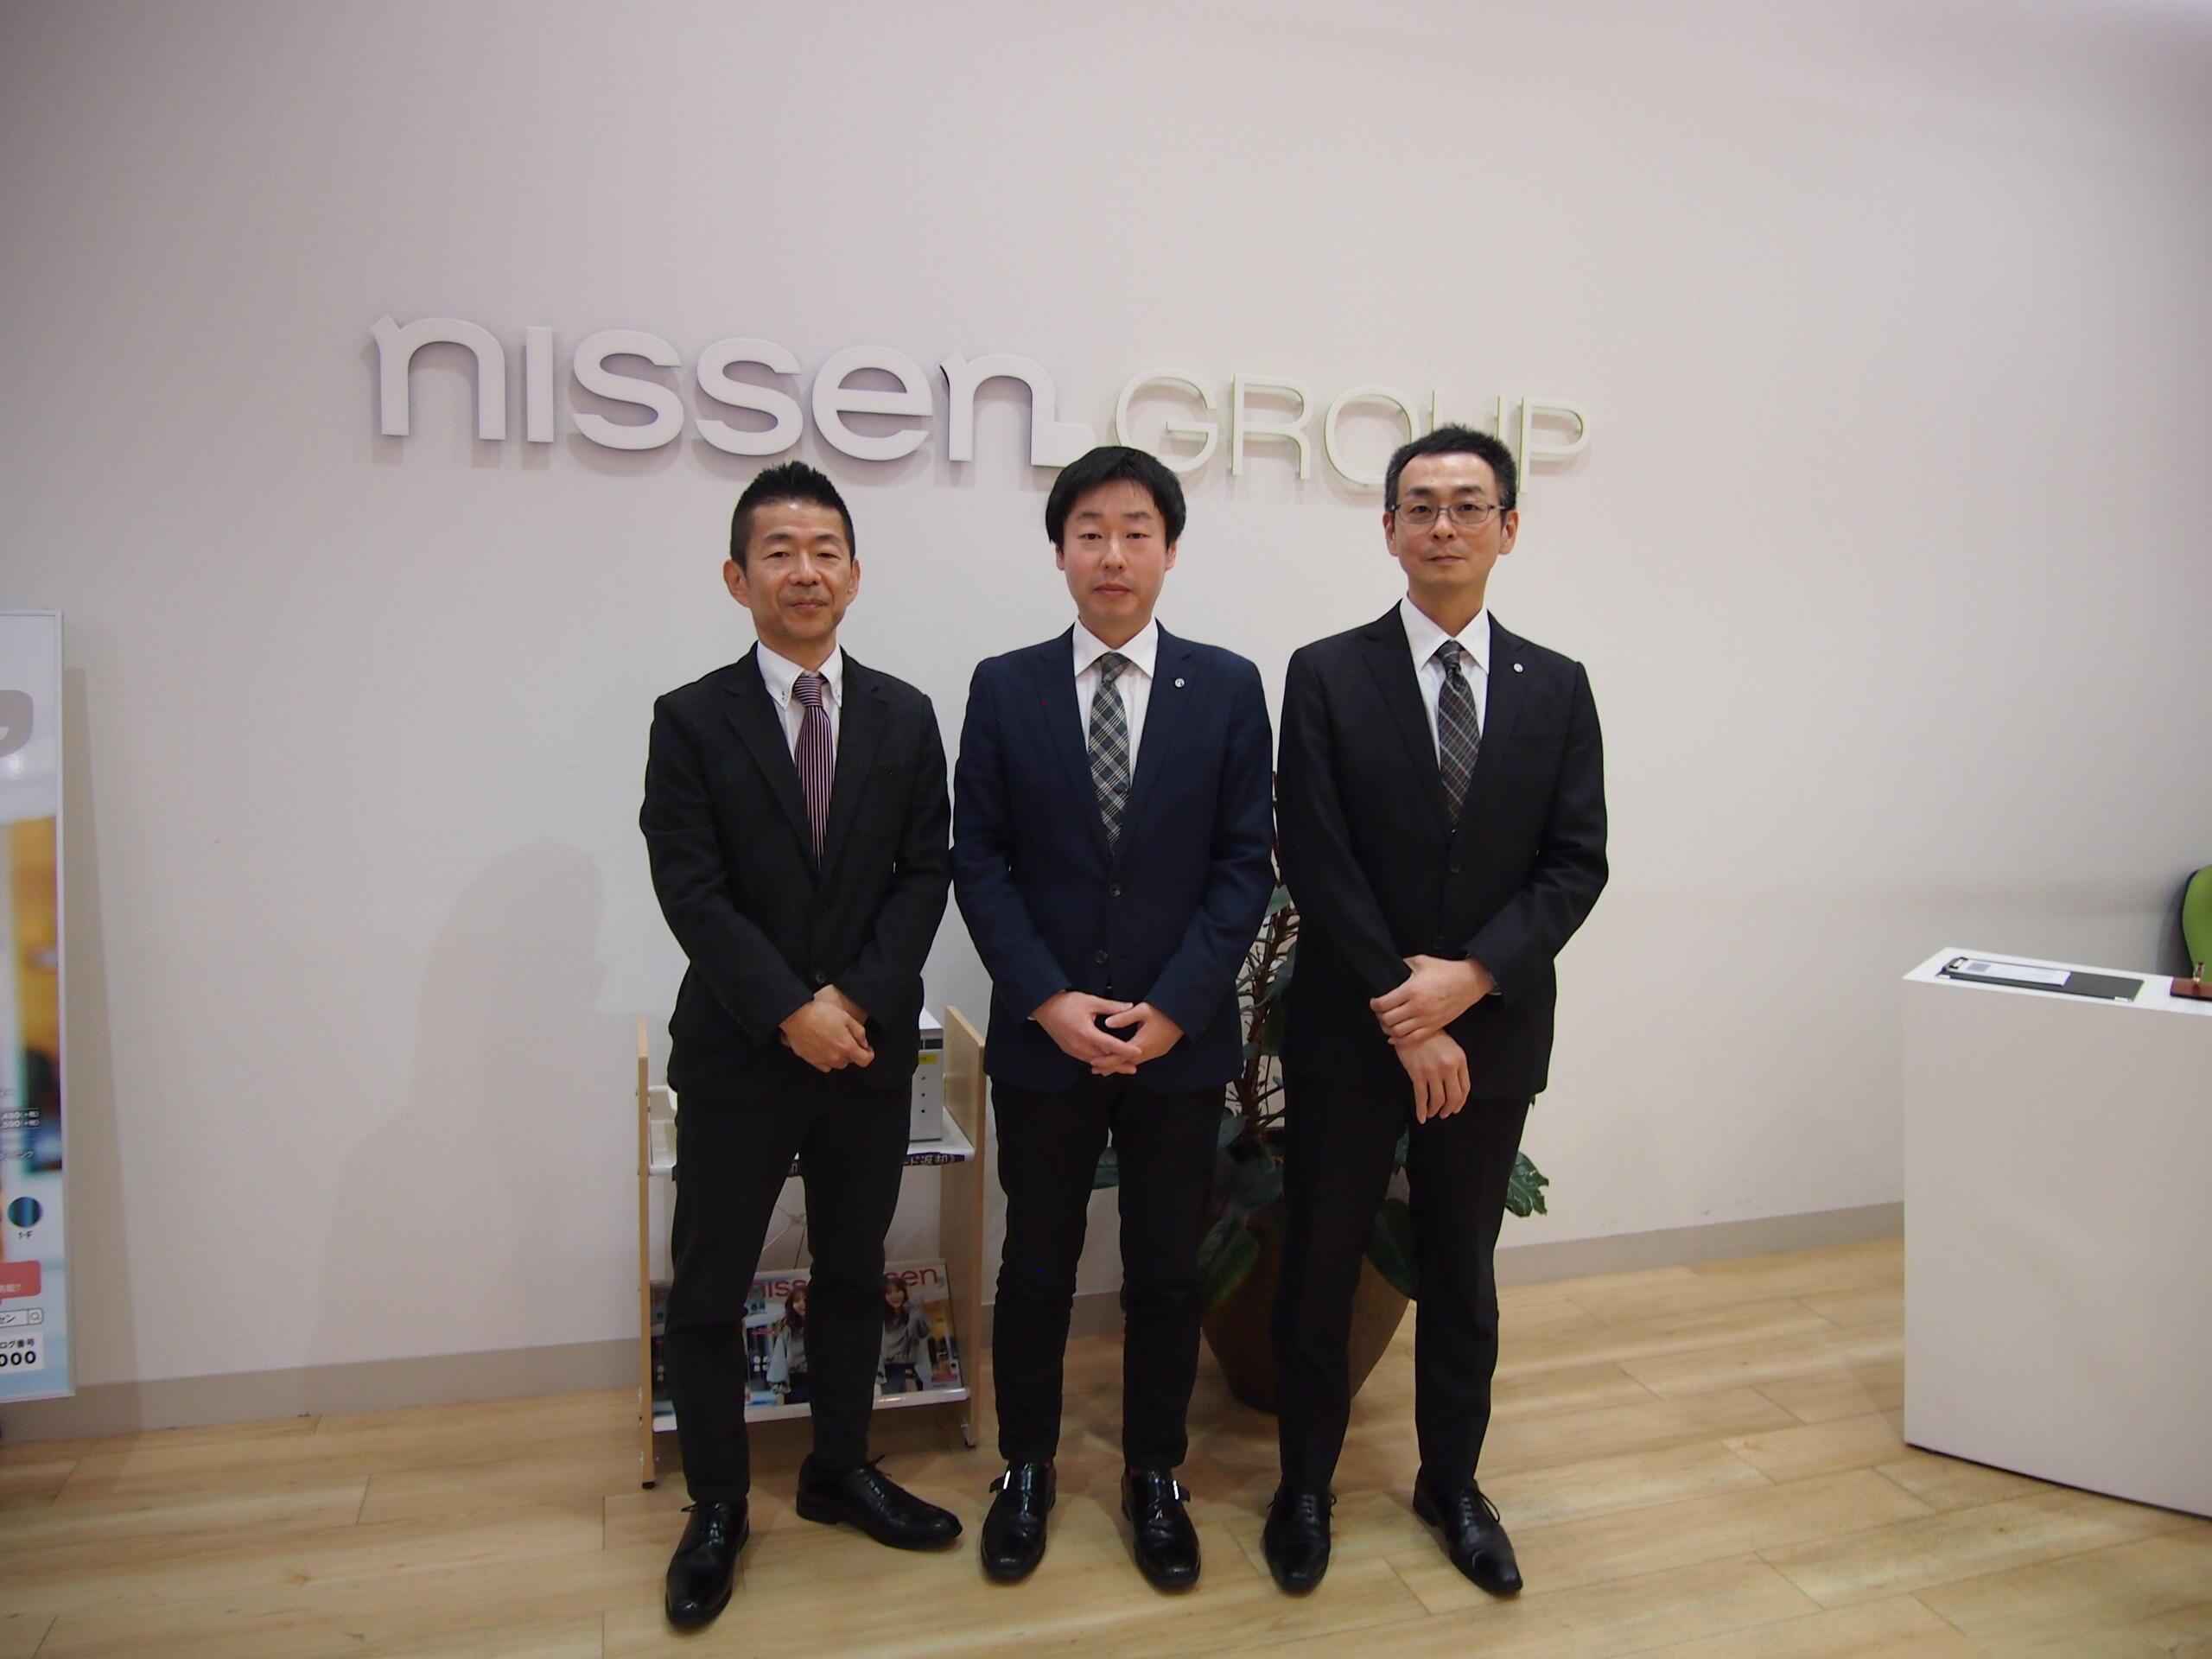 nissen_7.JPG